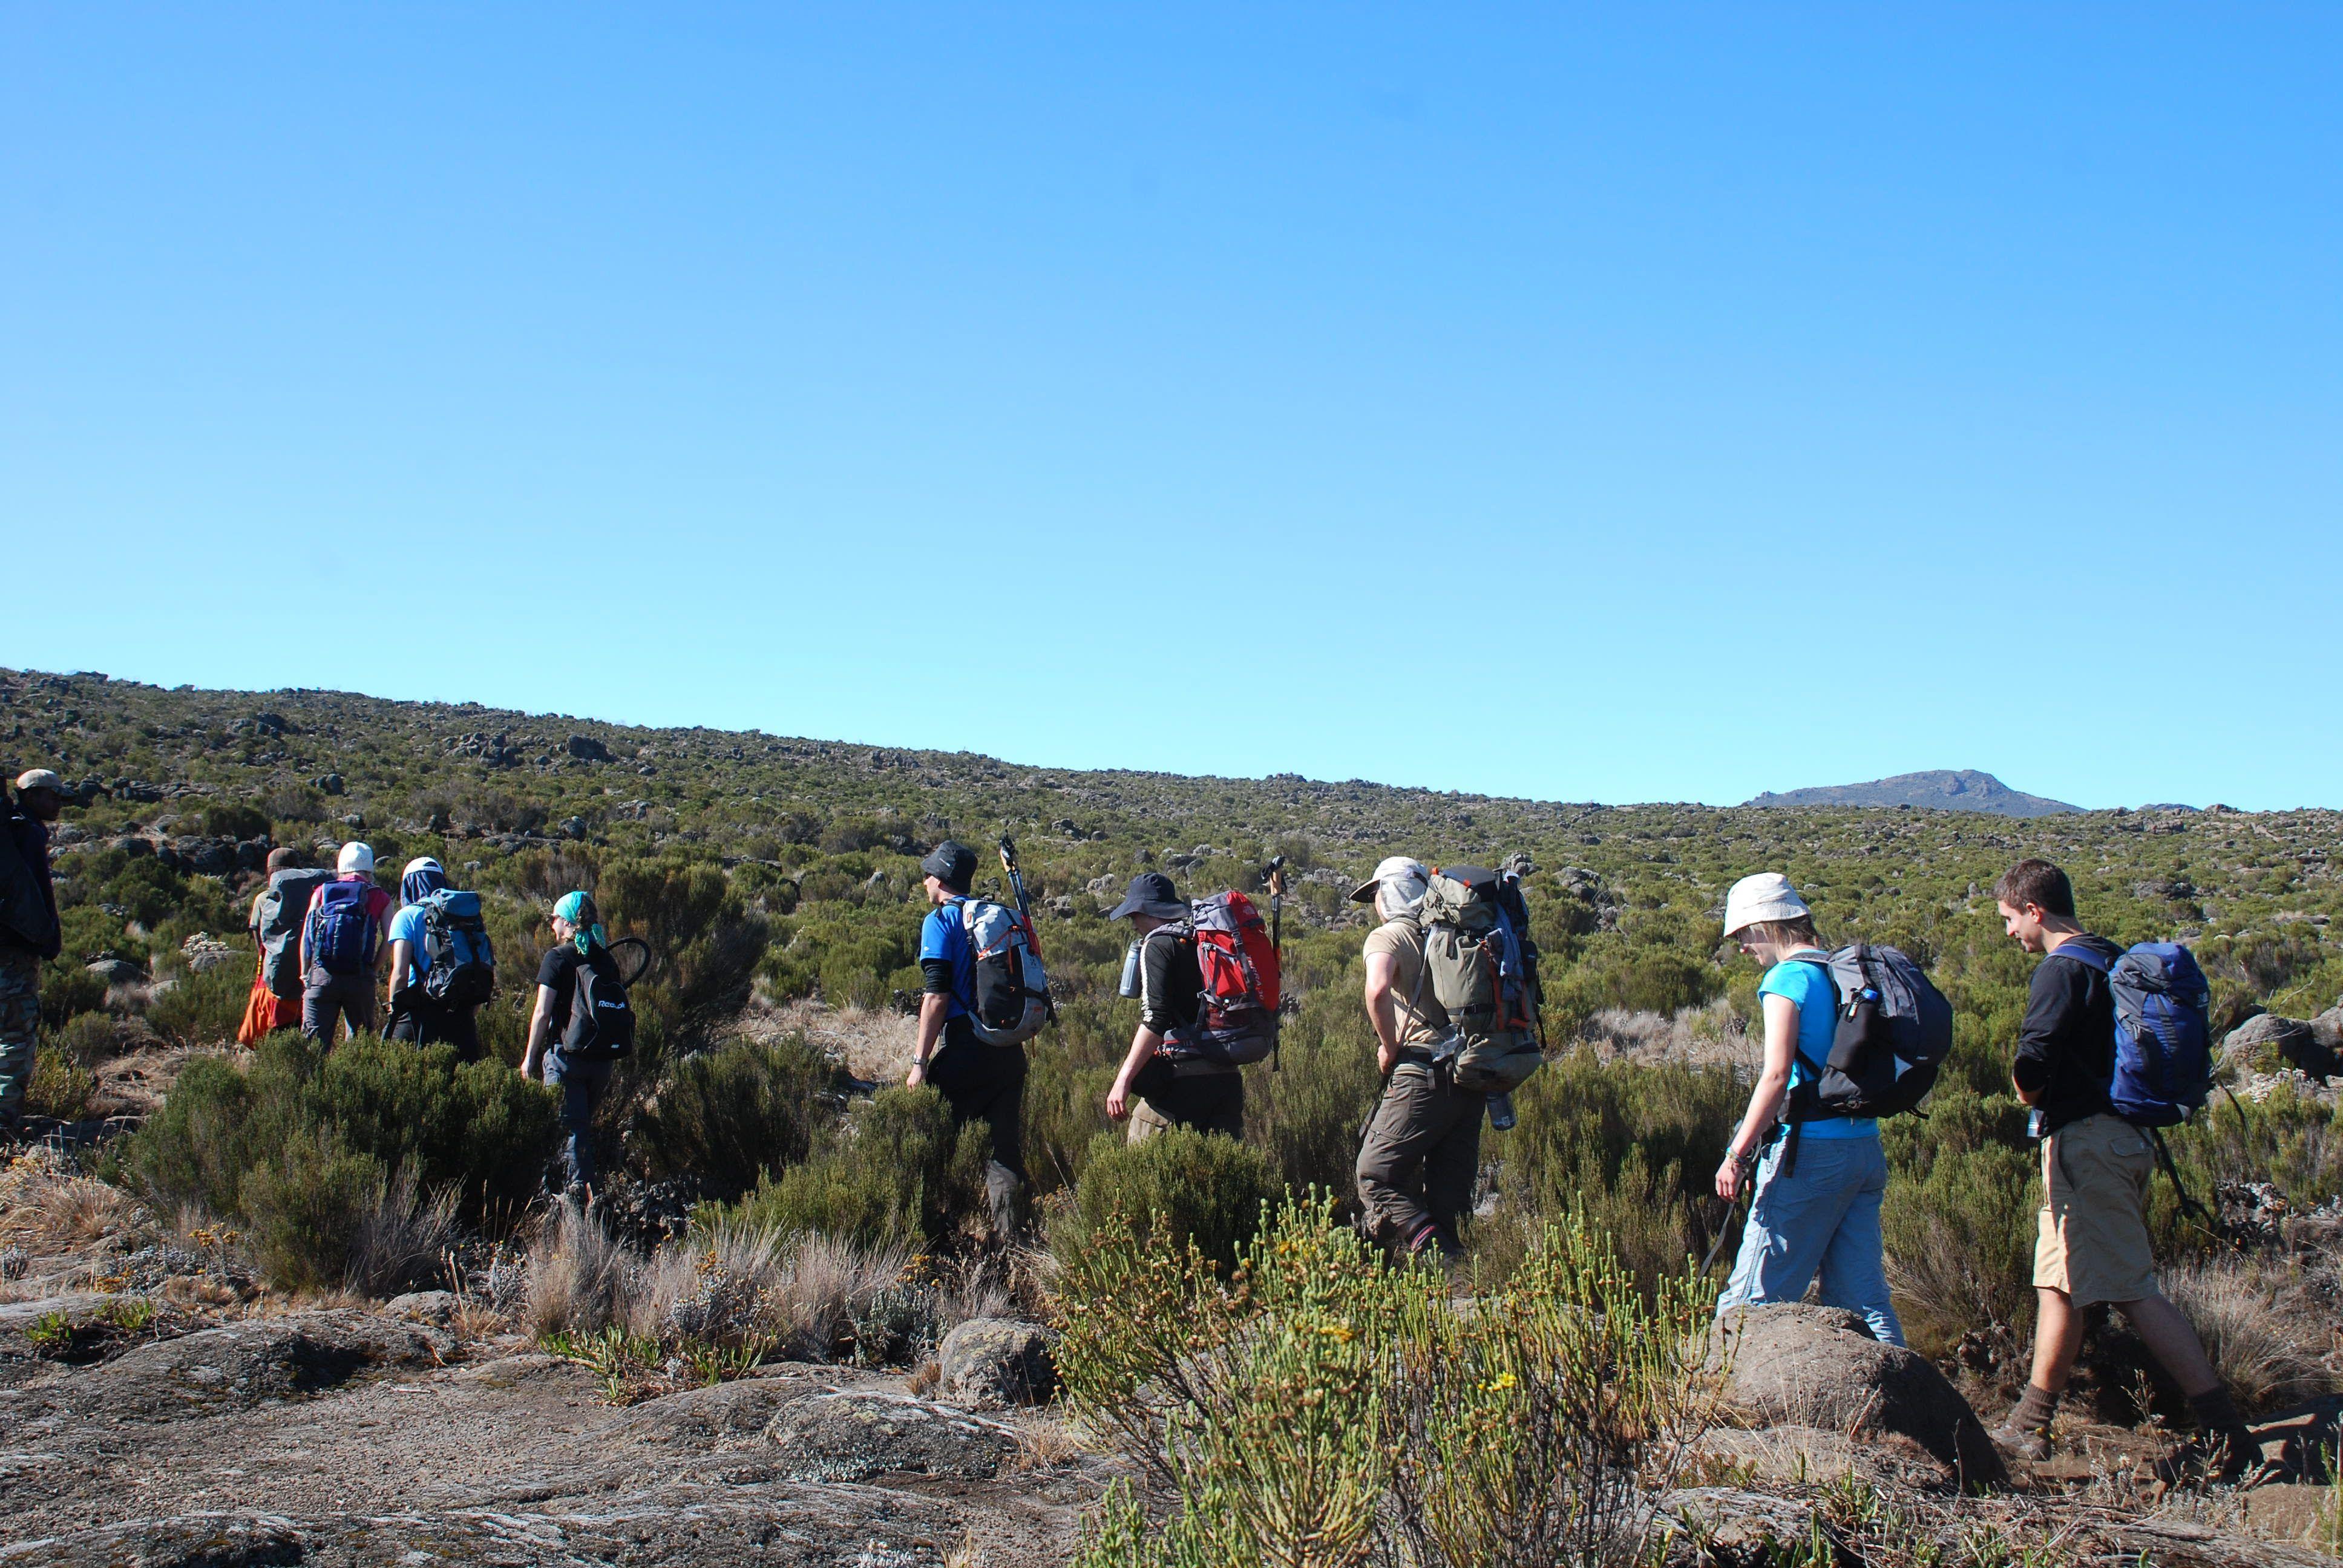 Setting off across the Shira Plateau, Day 2 Lemosho Route